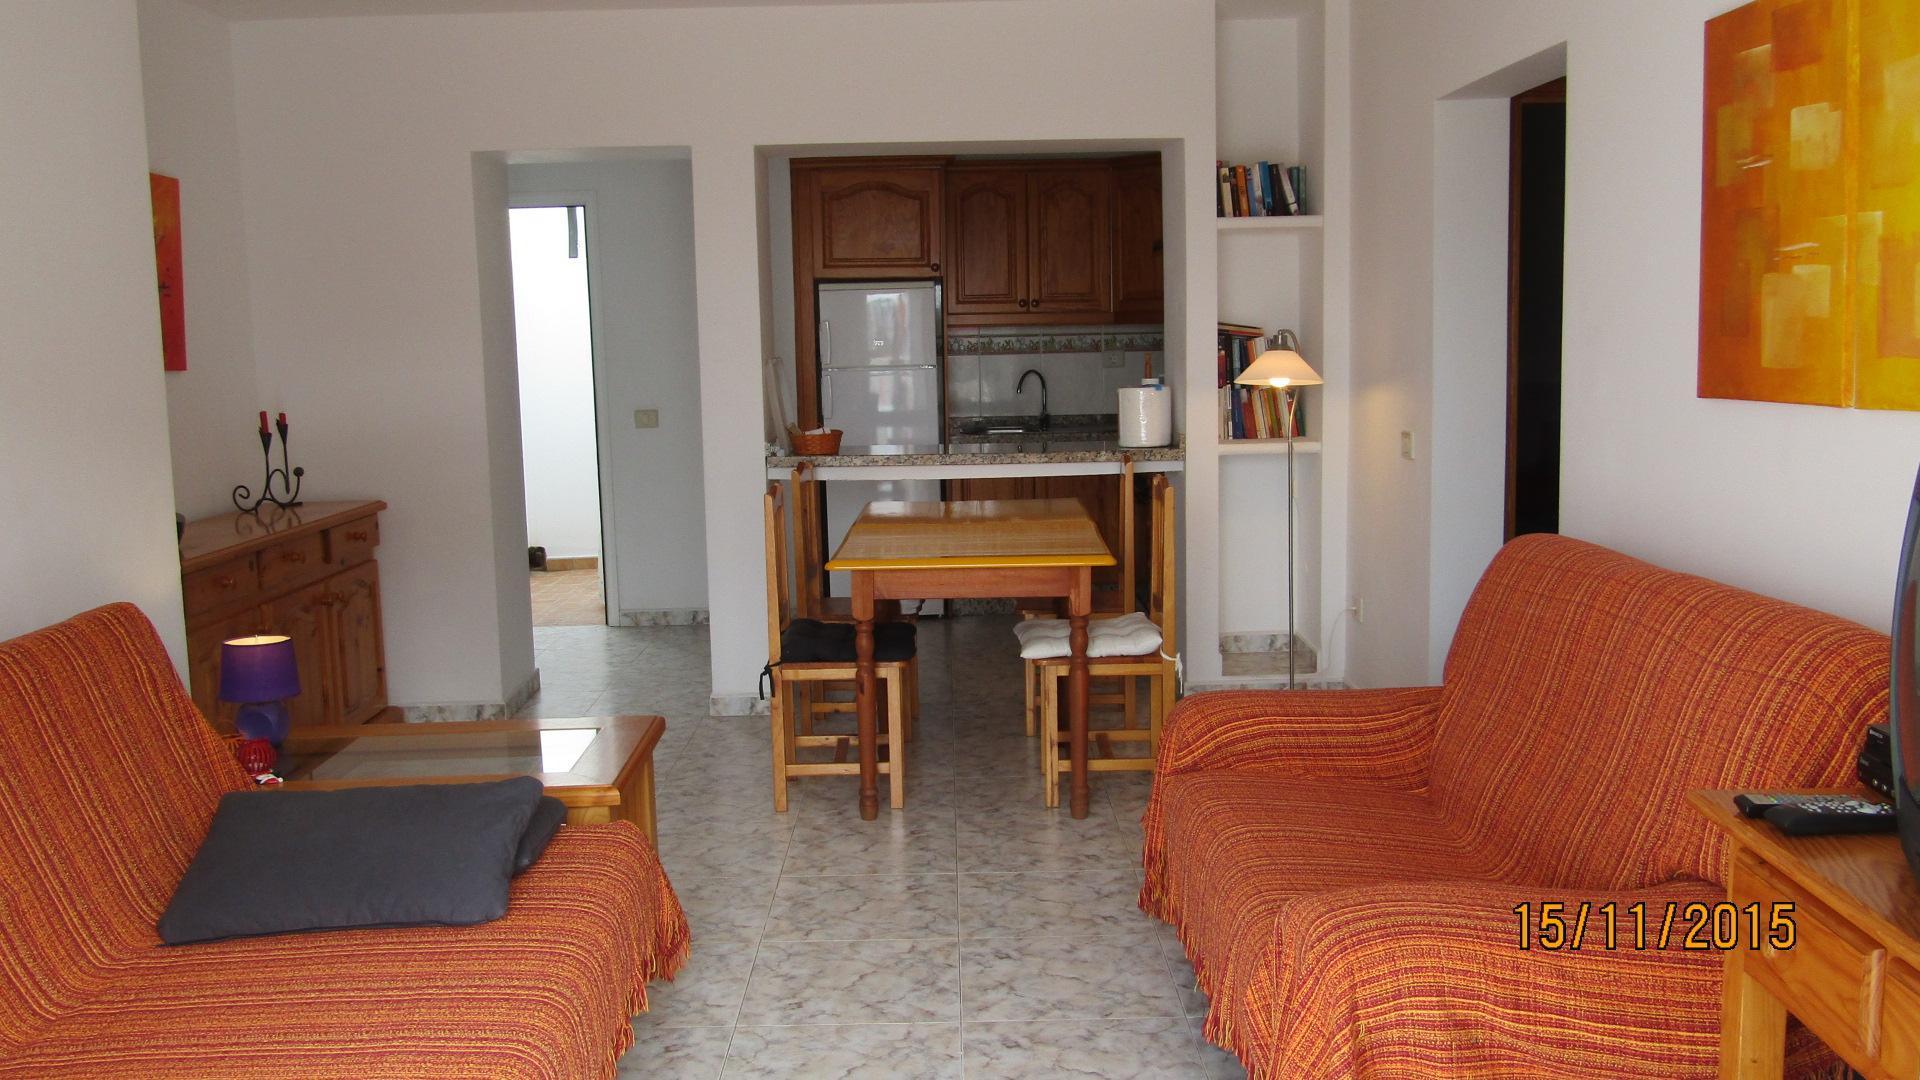 102515   Apartment In Lanzarote